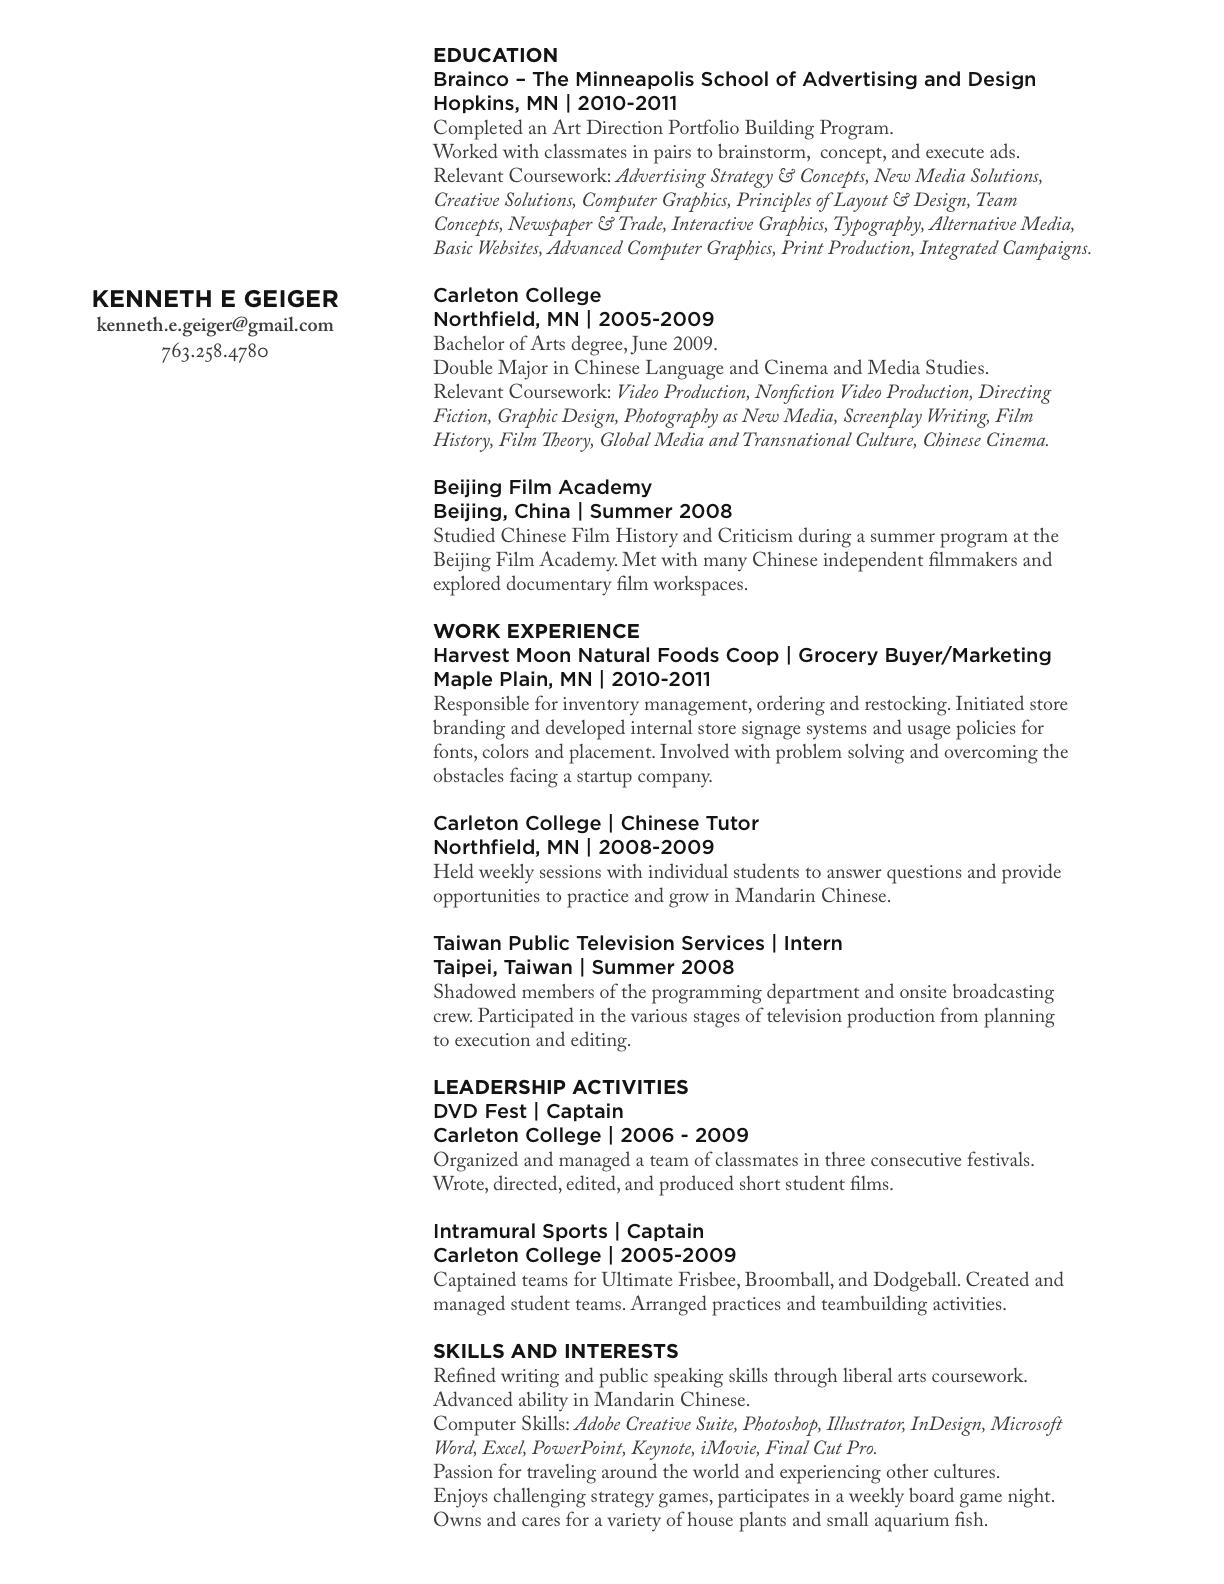 Academic article writing service llc list